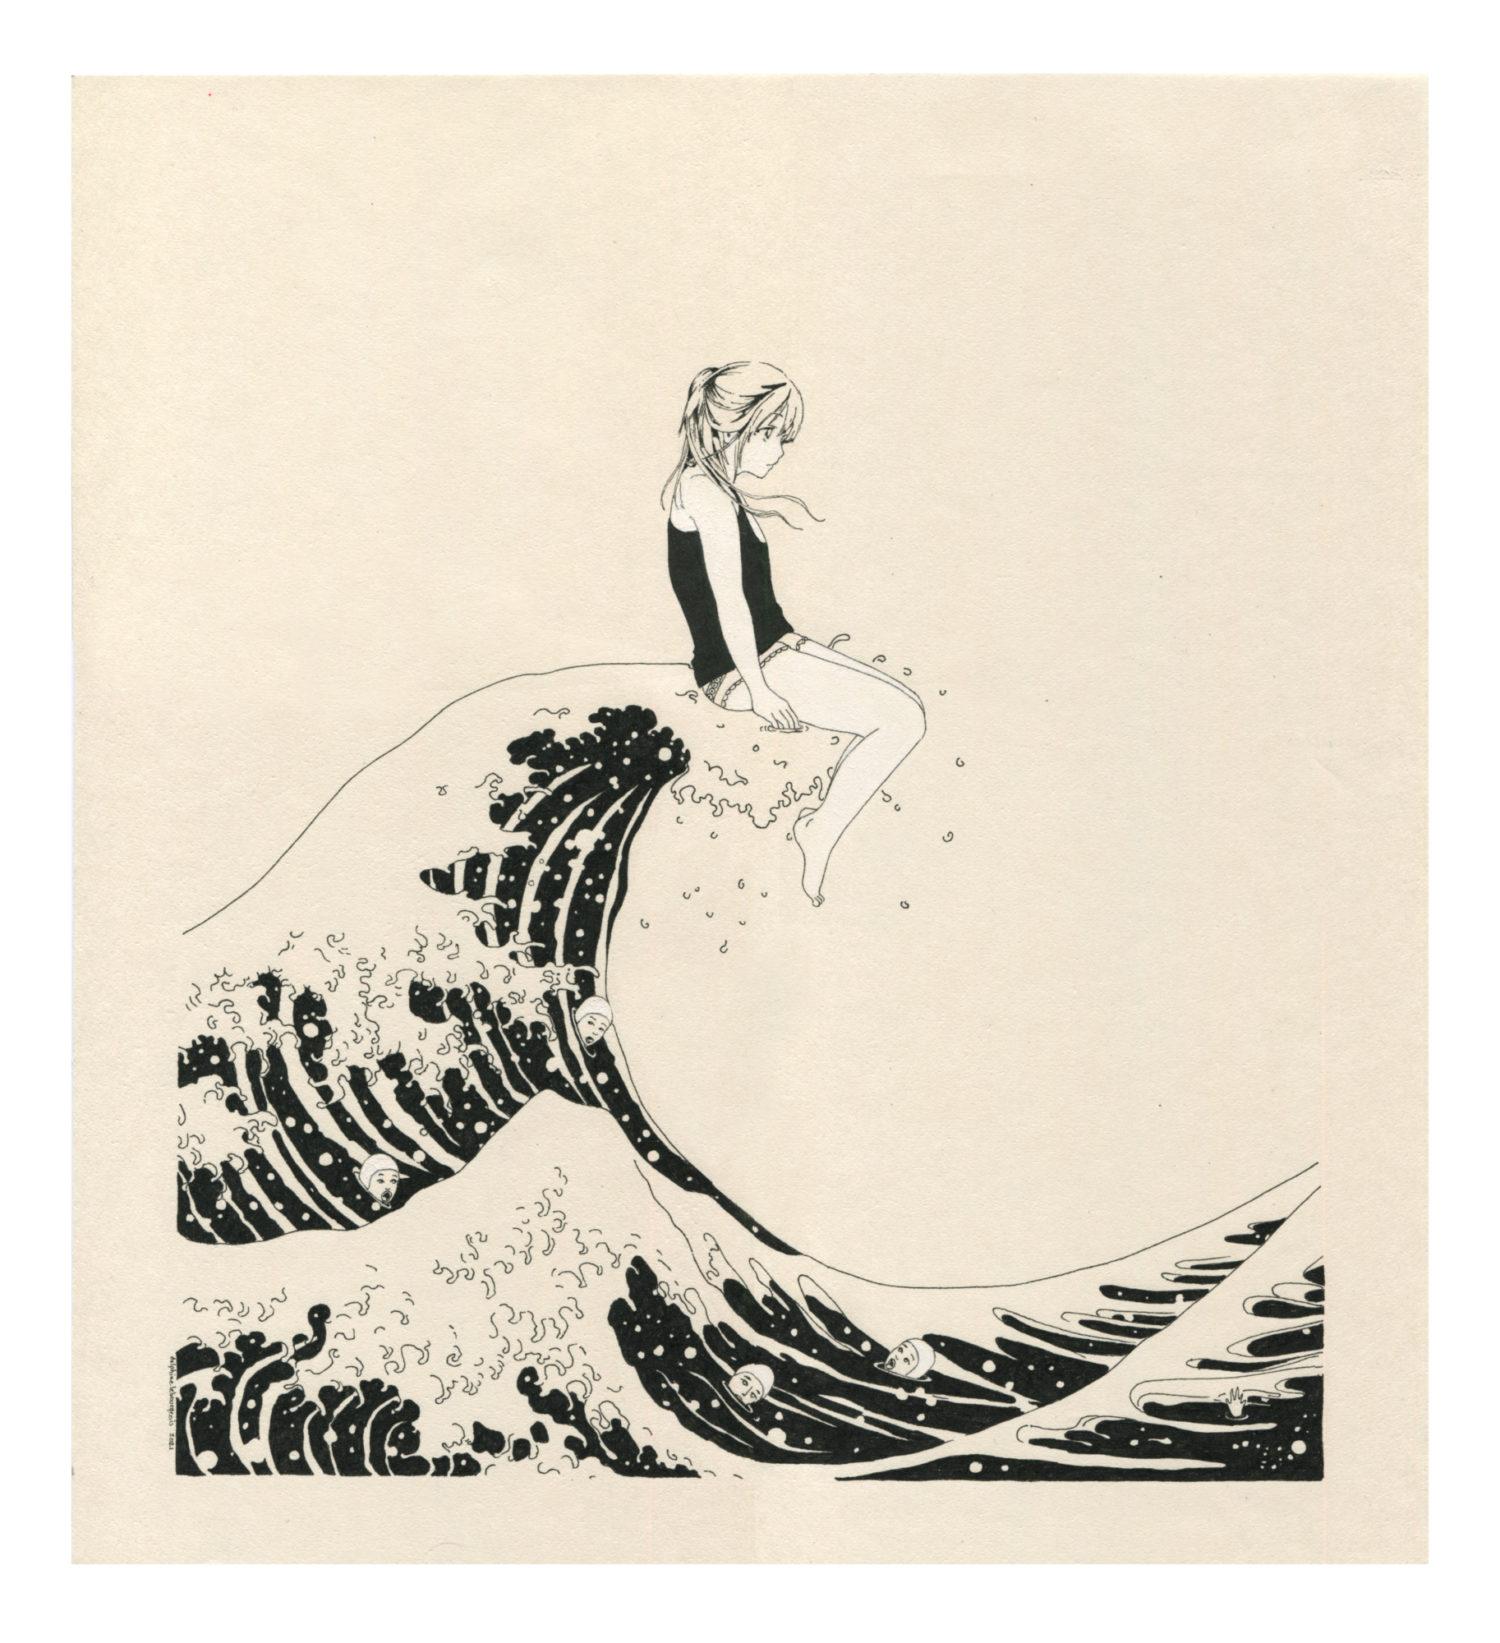 The Wave (after Hokusai)